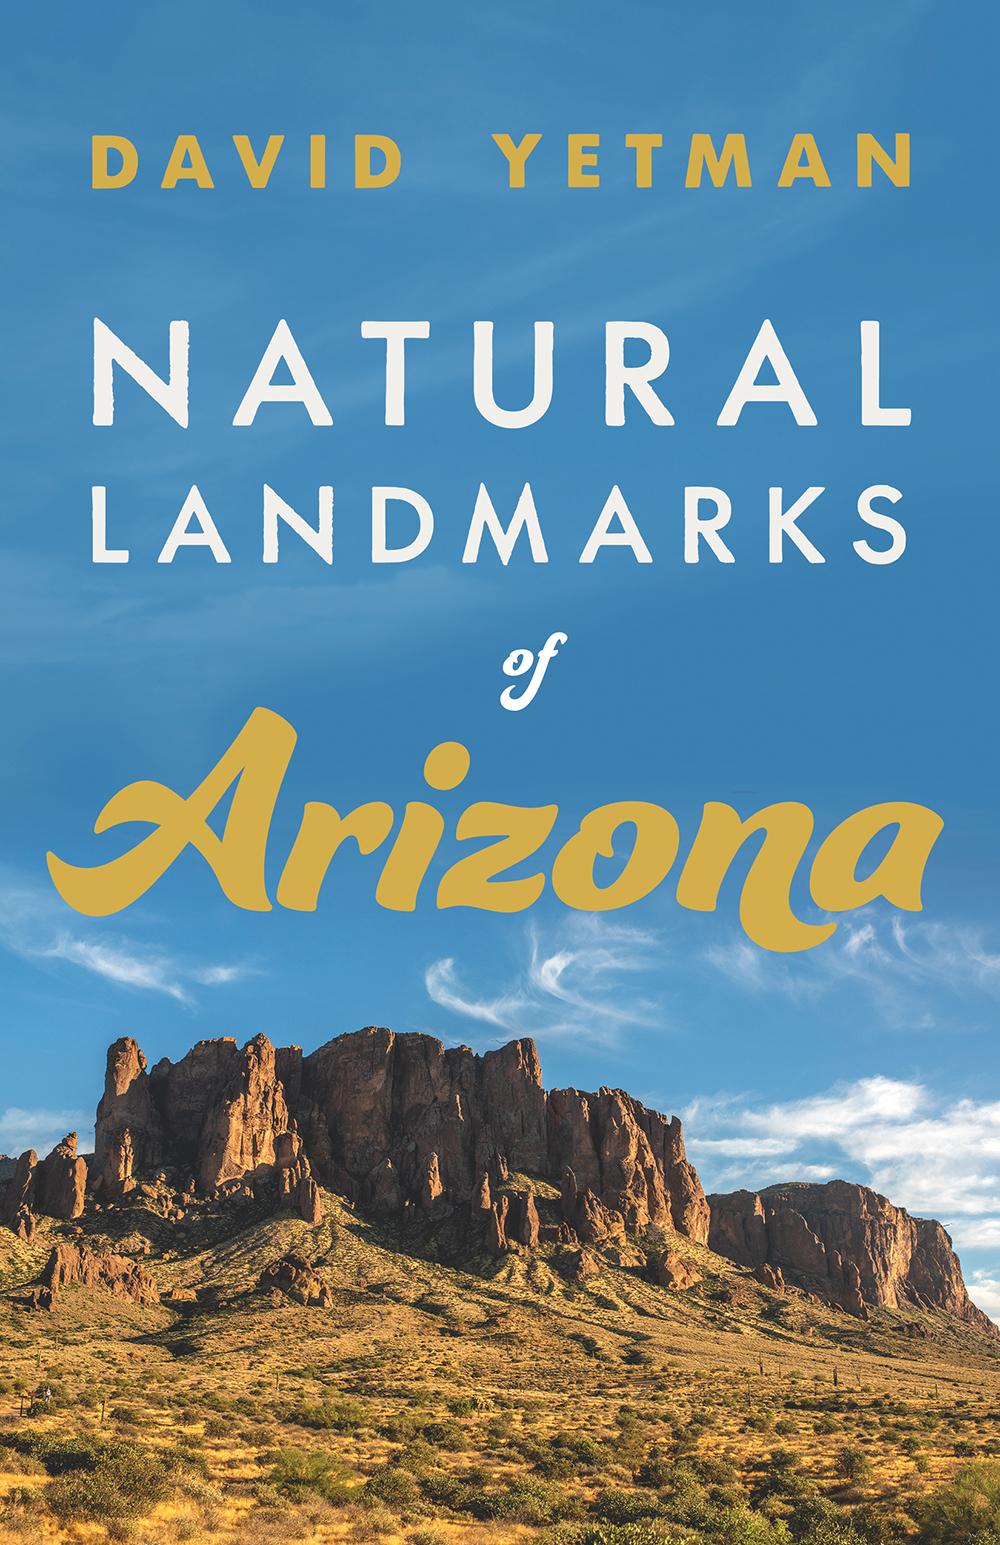 Natural Landmarks of Arizona - David Yetman